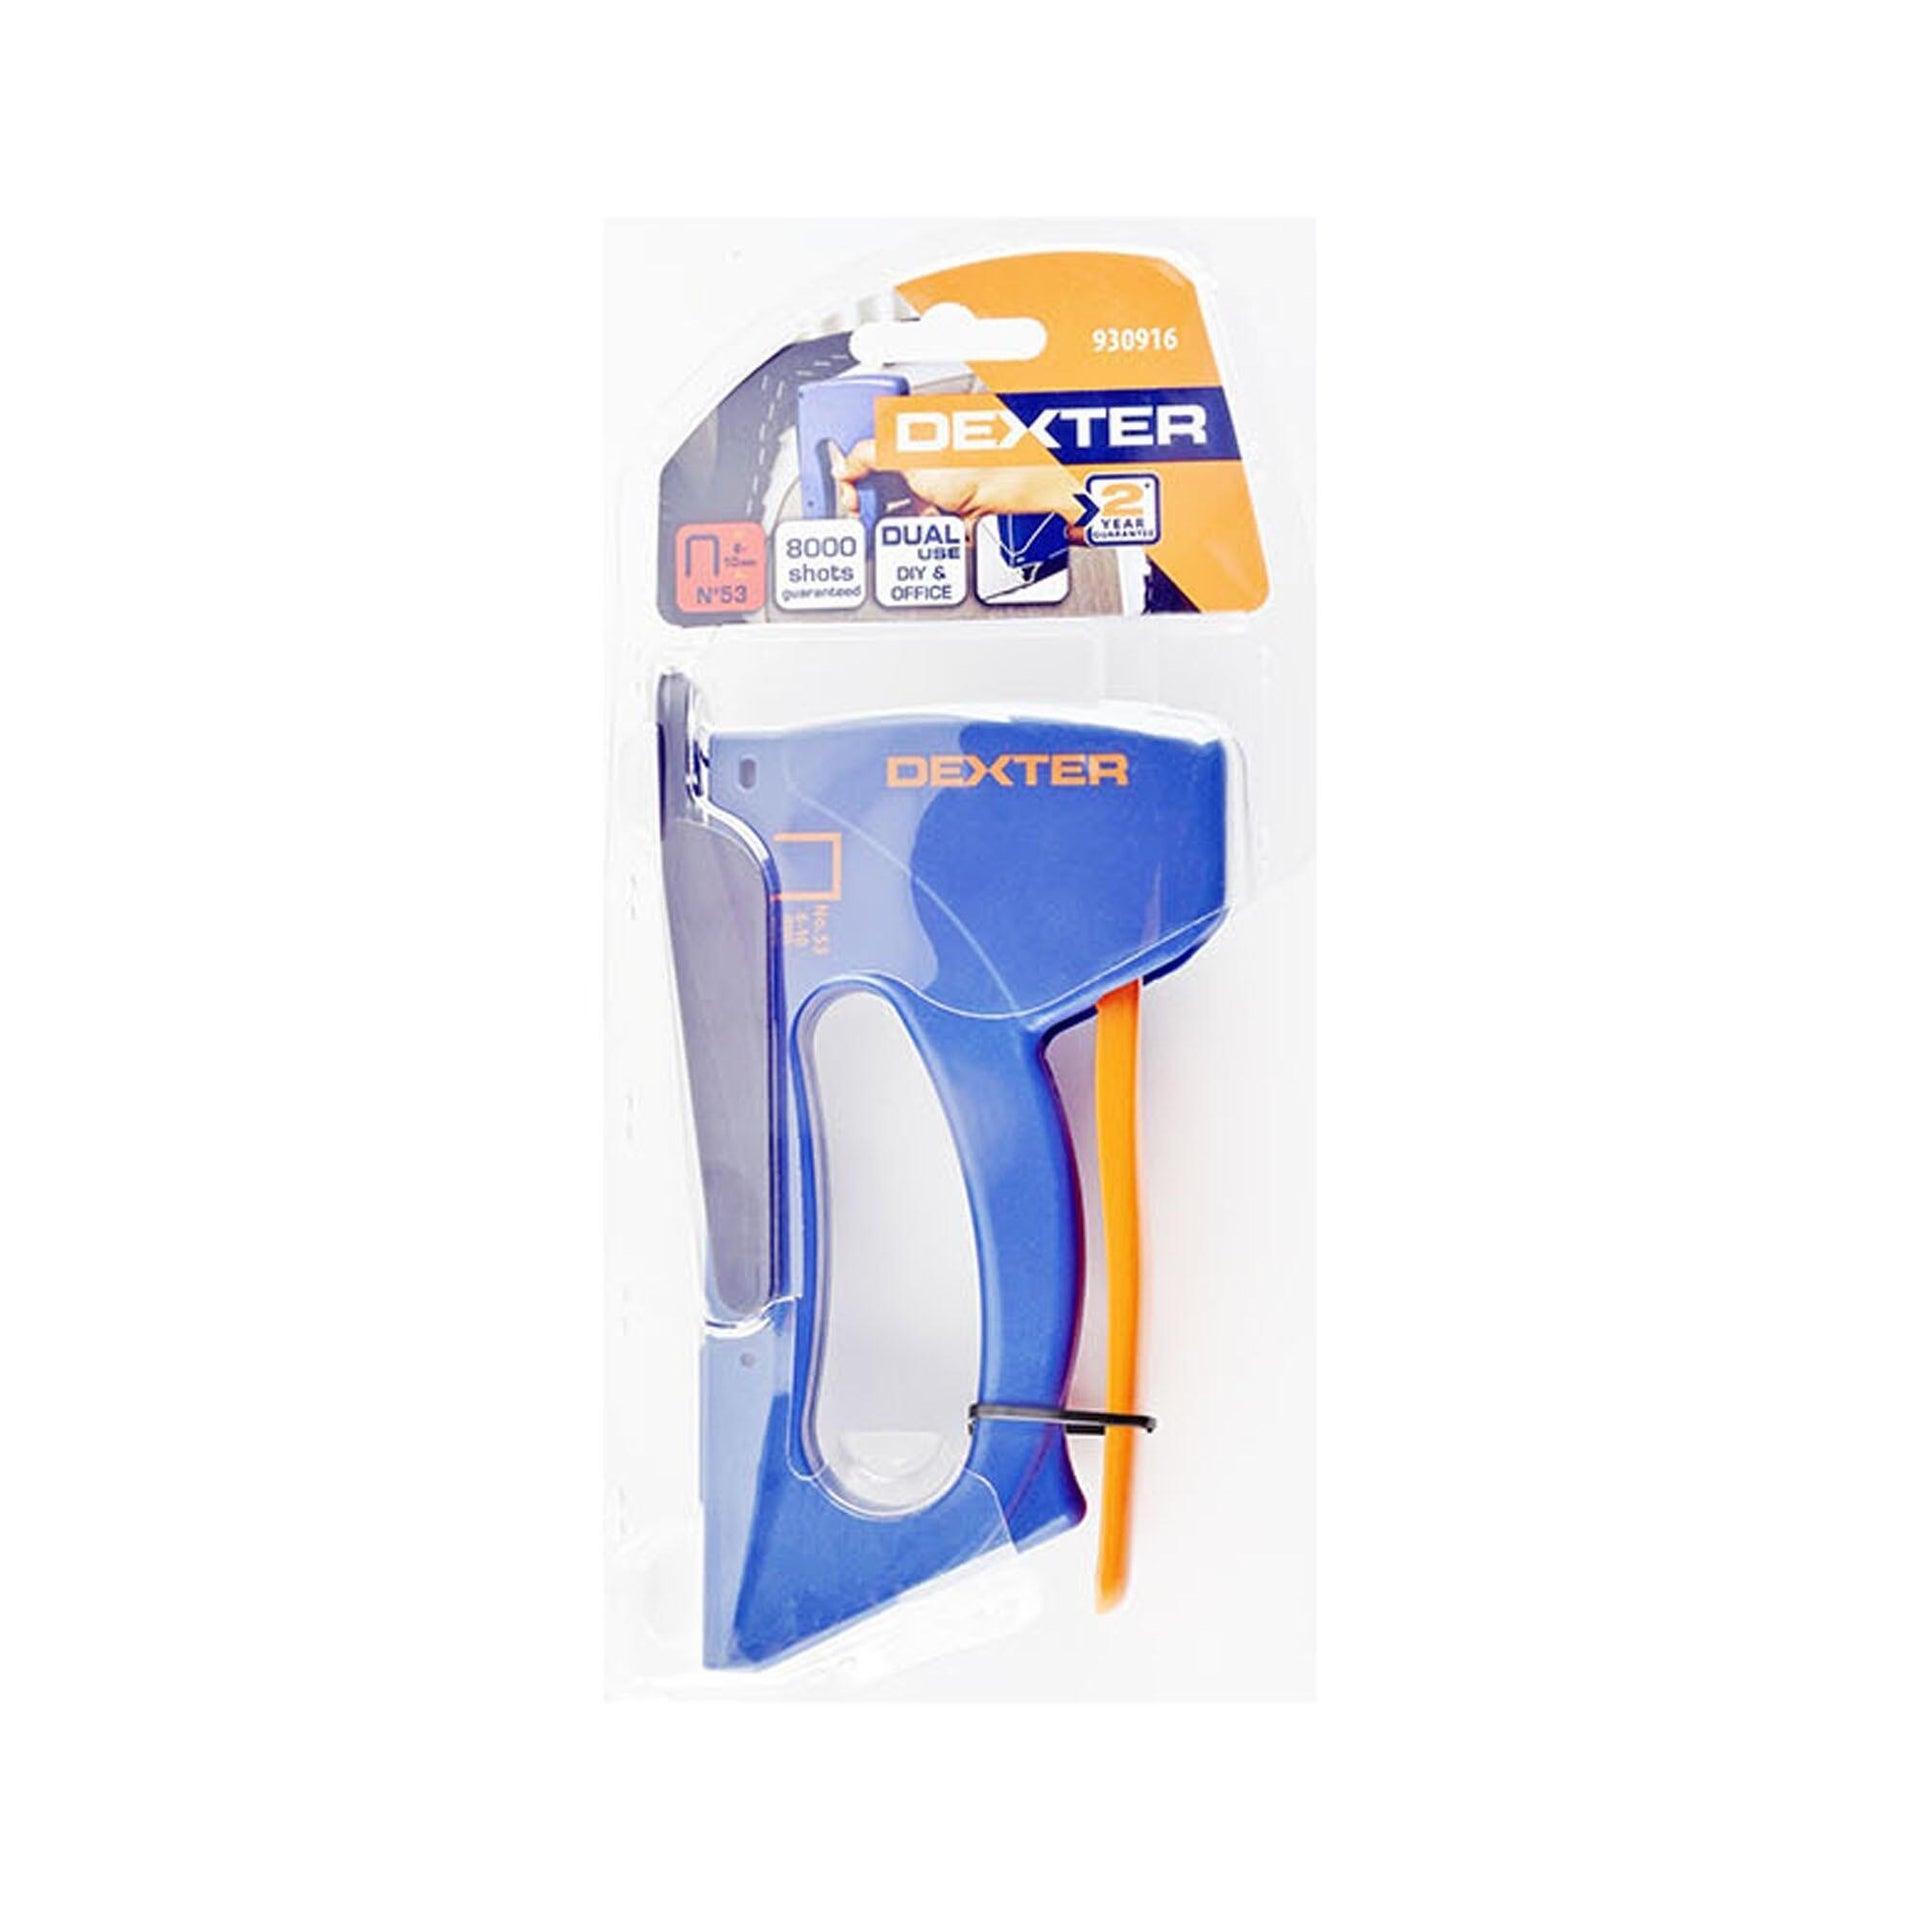 Spillatrice manuale DEXTER - 2